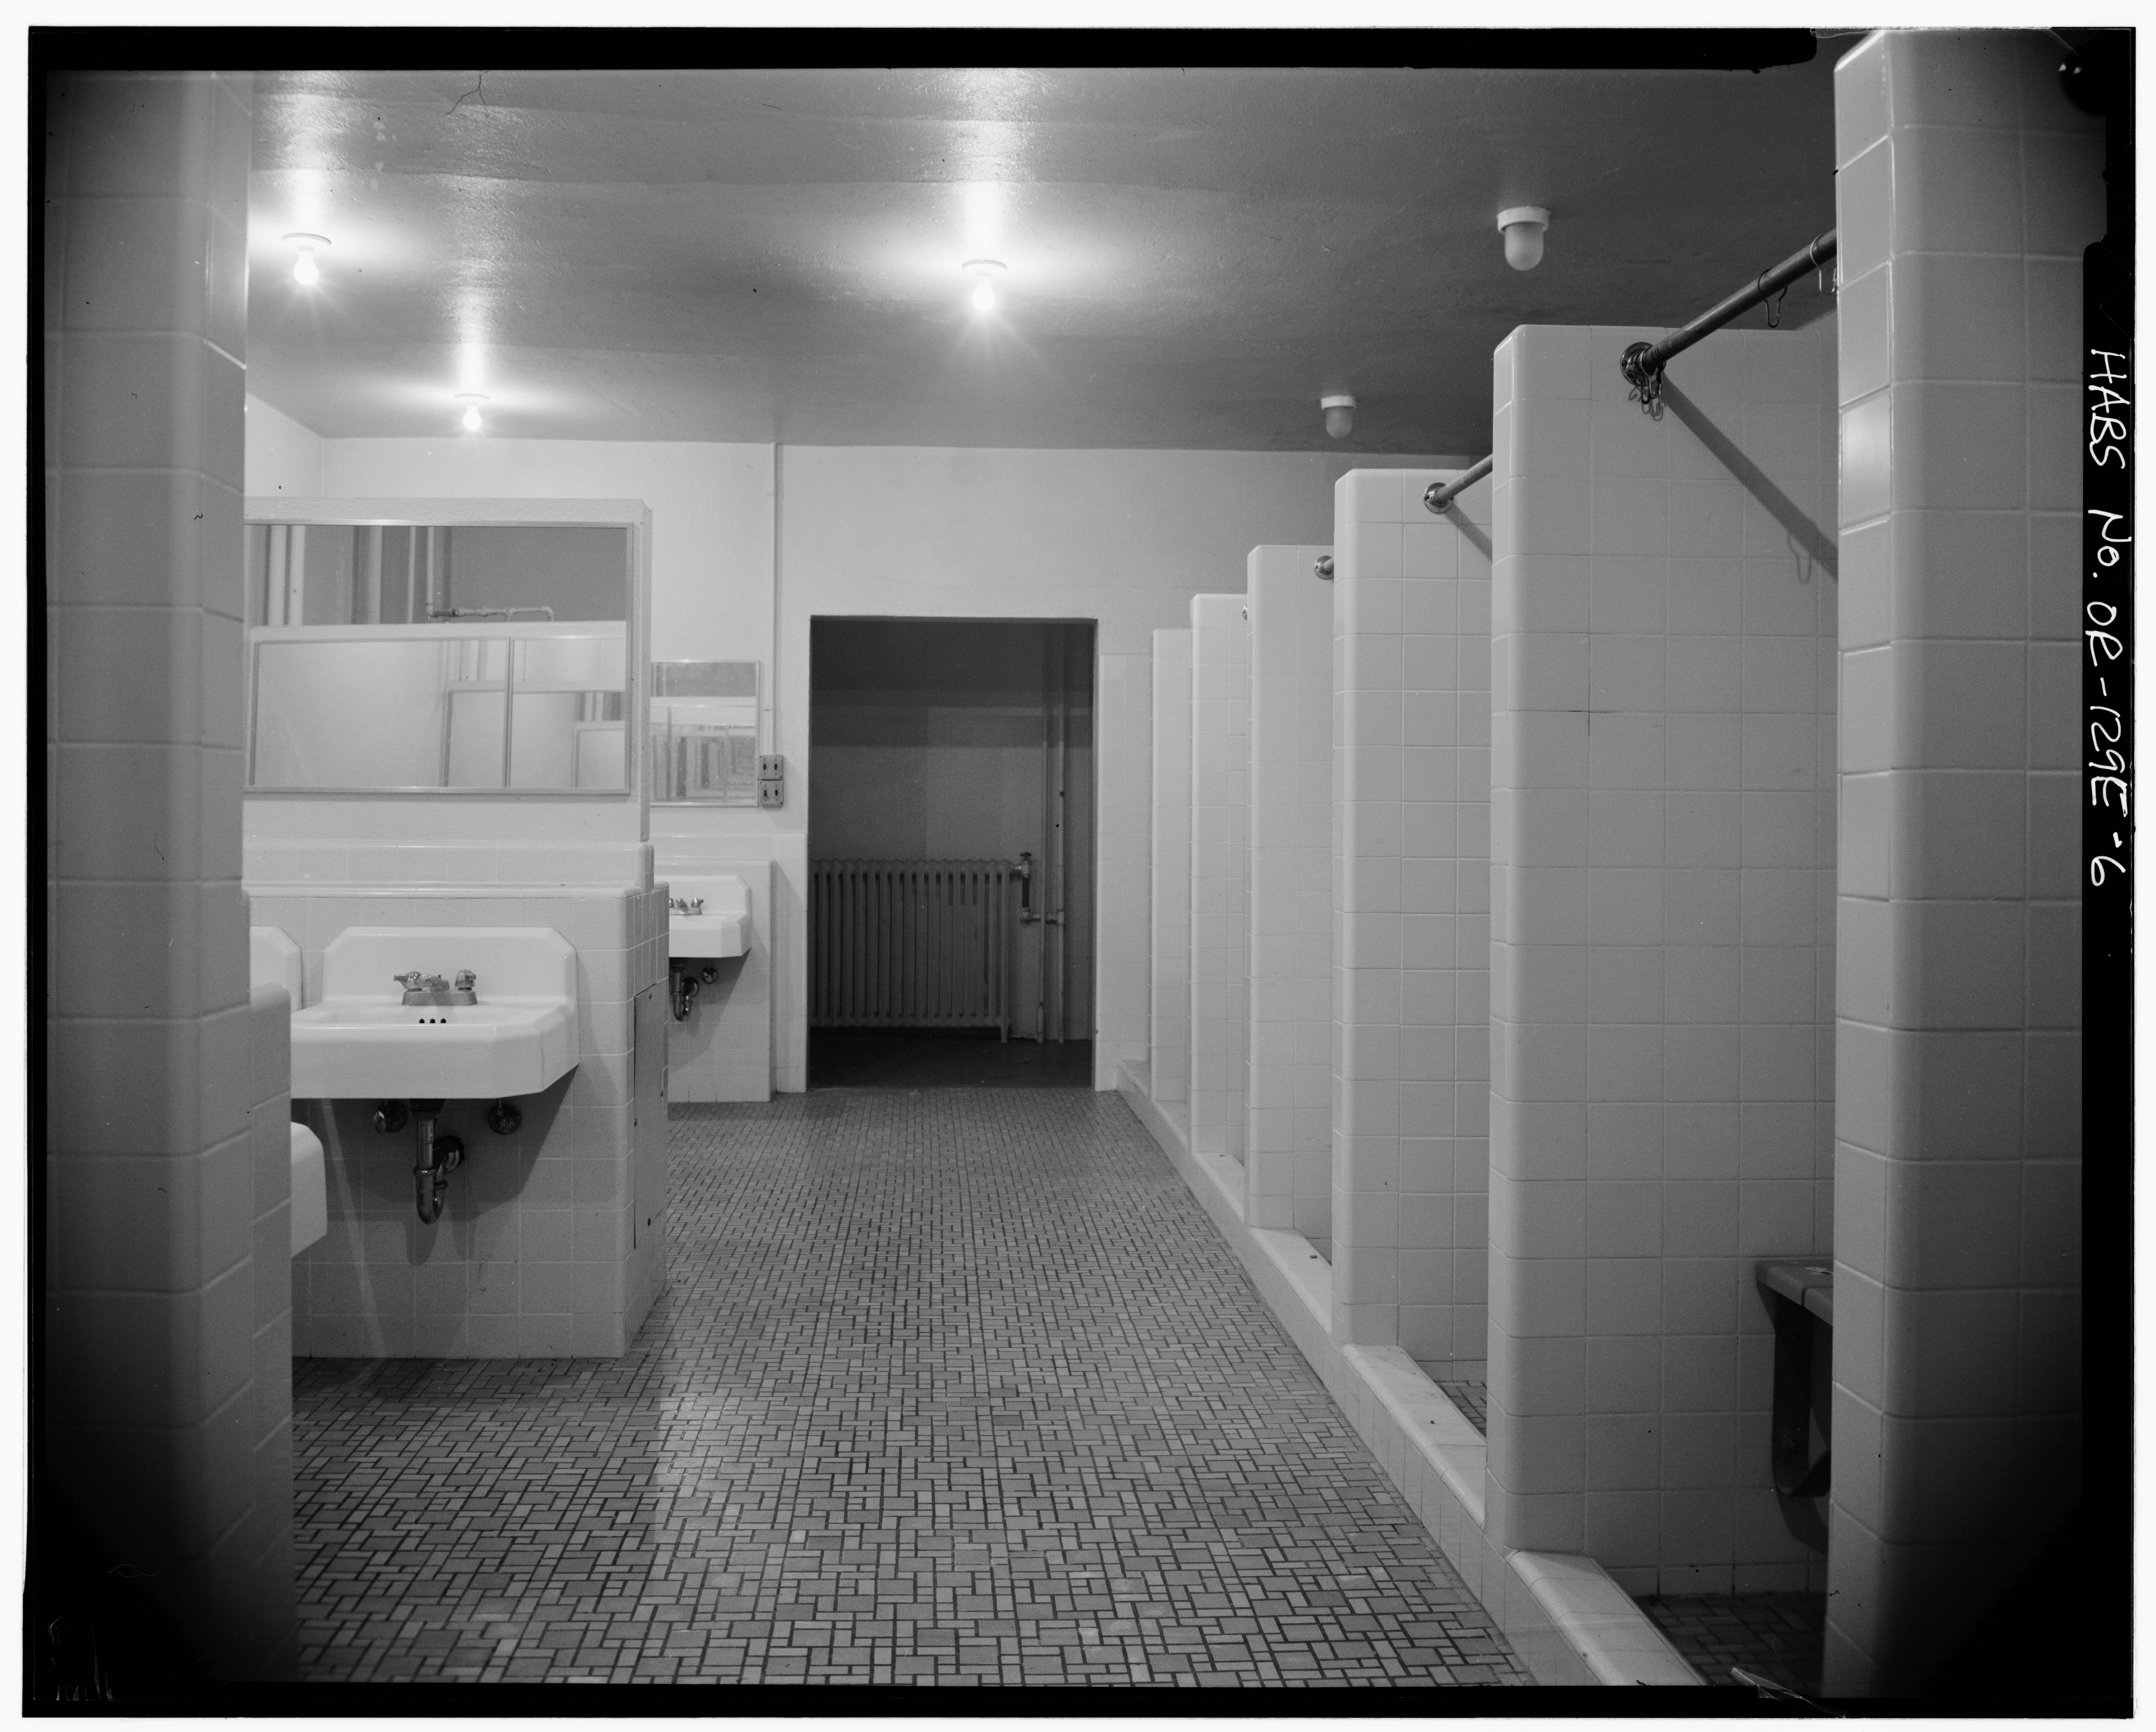 file 5495 chugath street winona hall bathroom chemawa indian school salem. Black Bedroom Furniture Sets. Home Design Ideas